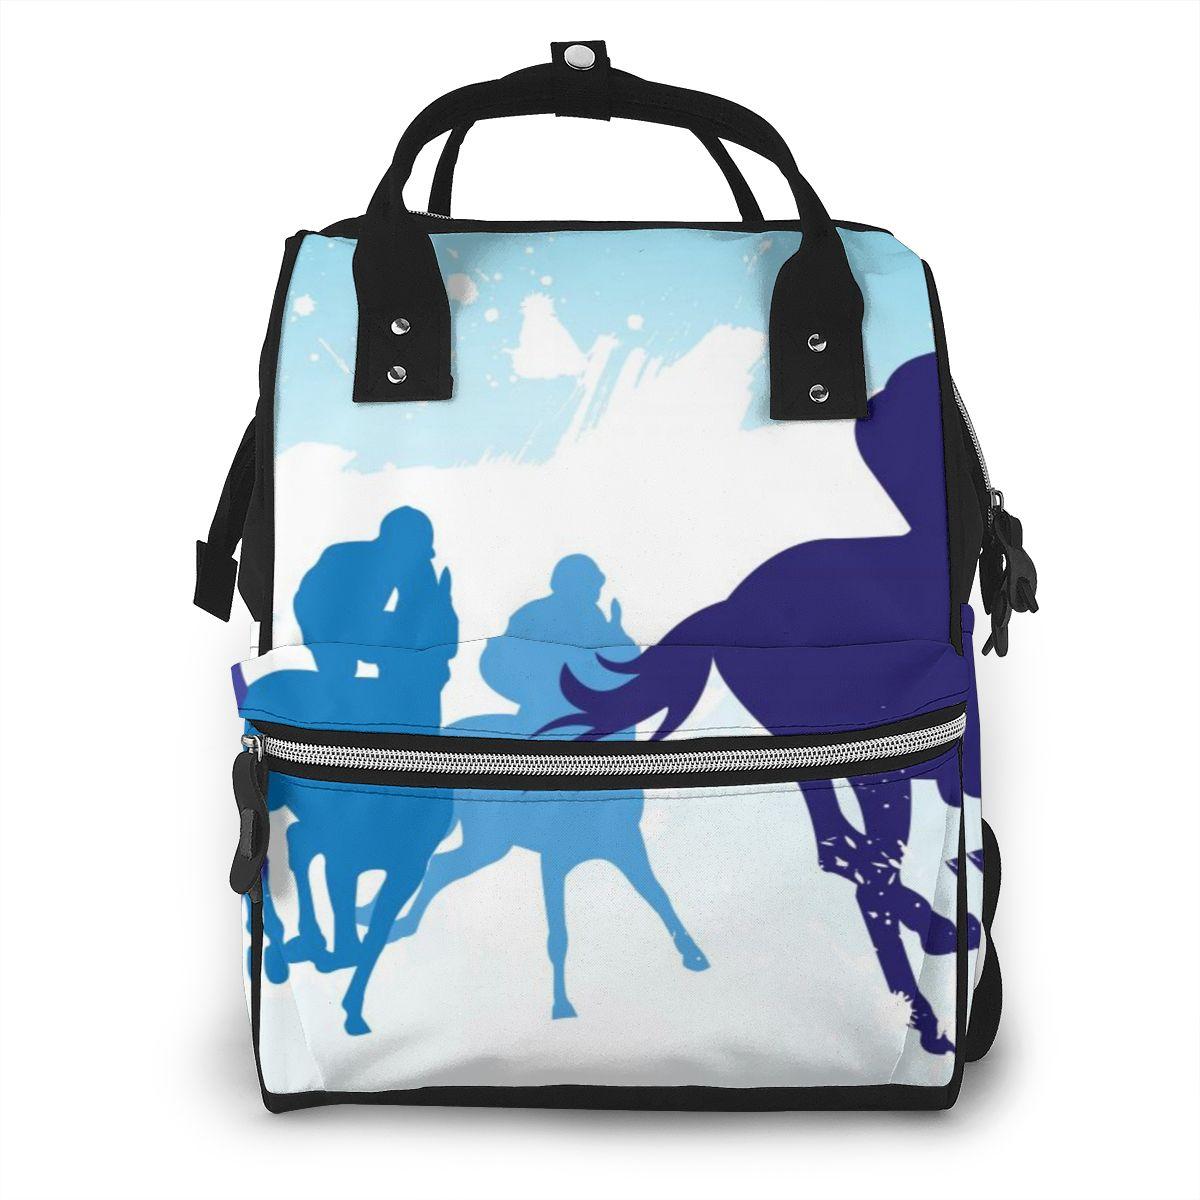 Bolsa de pañales azul para carreras de caballos y Jockeys, bolsas de maternidad para mamá, bolsas de viaje para bebé, mochila cambiante, organizador para cochecito de mujer